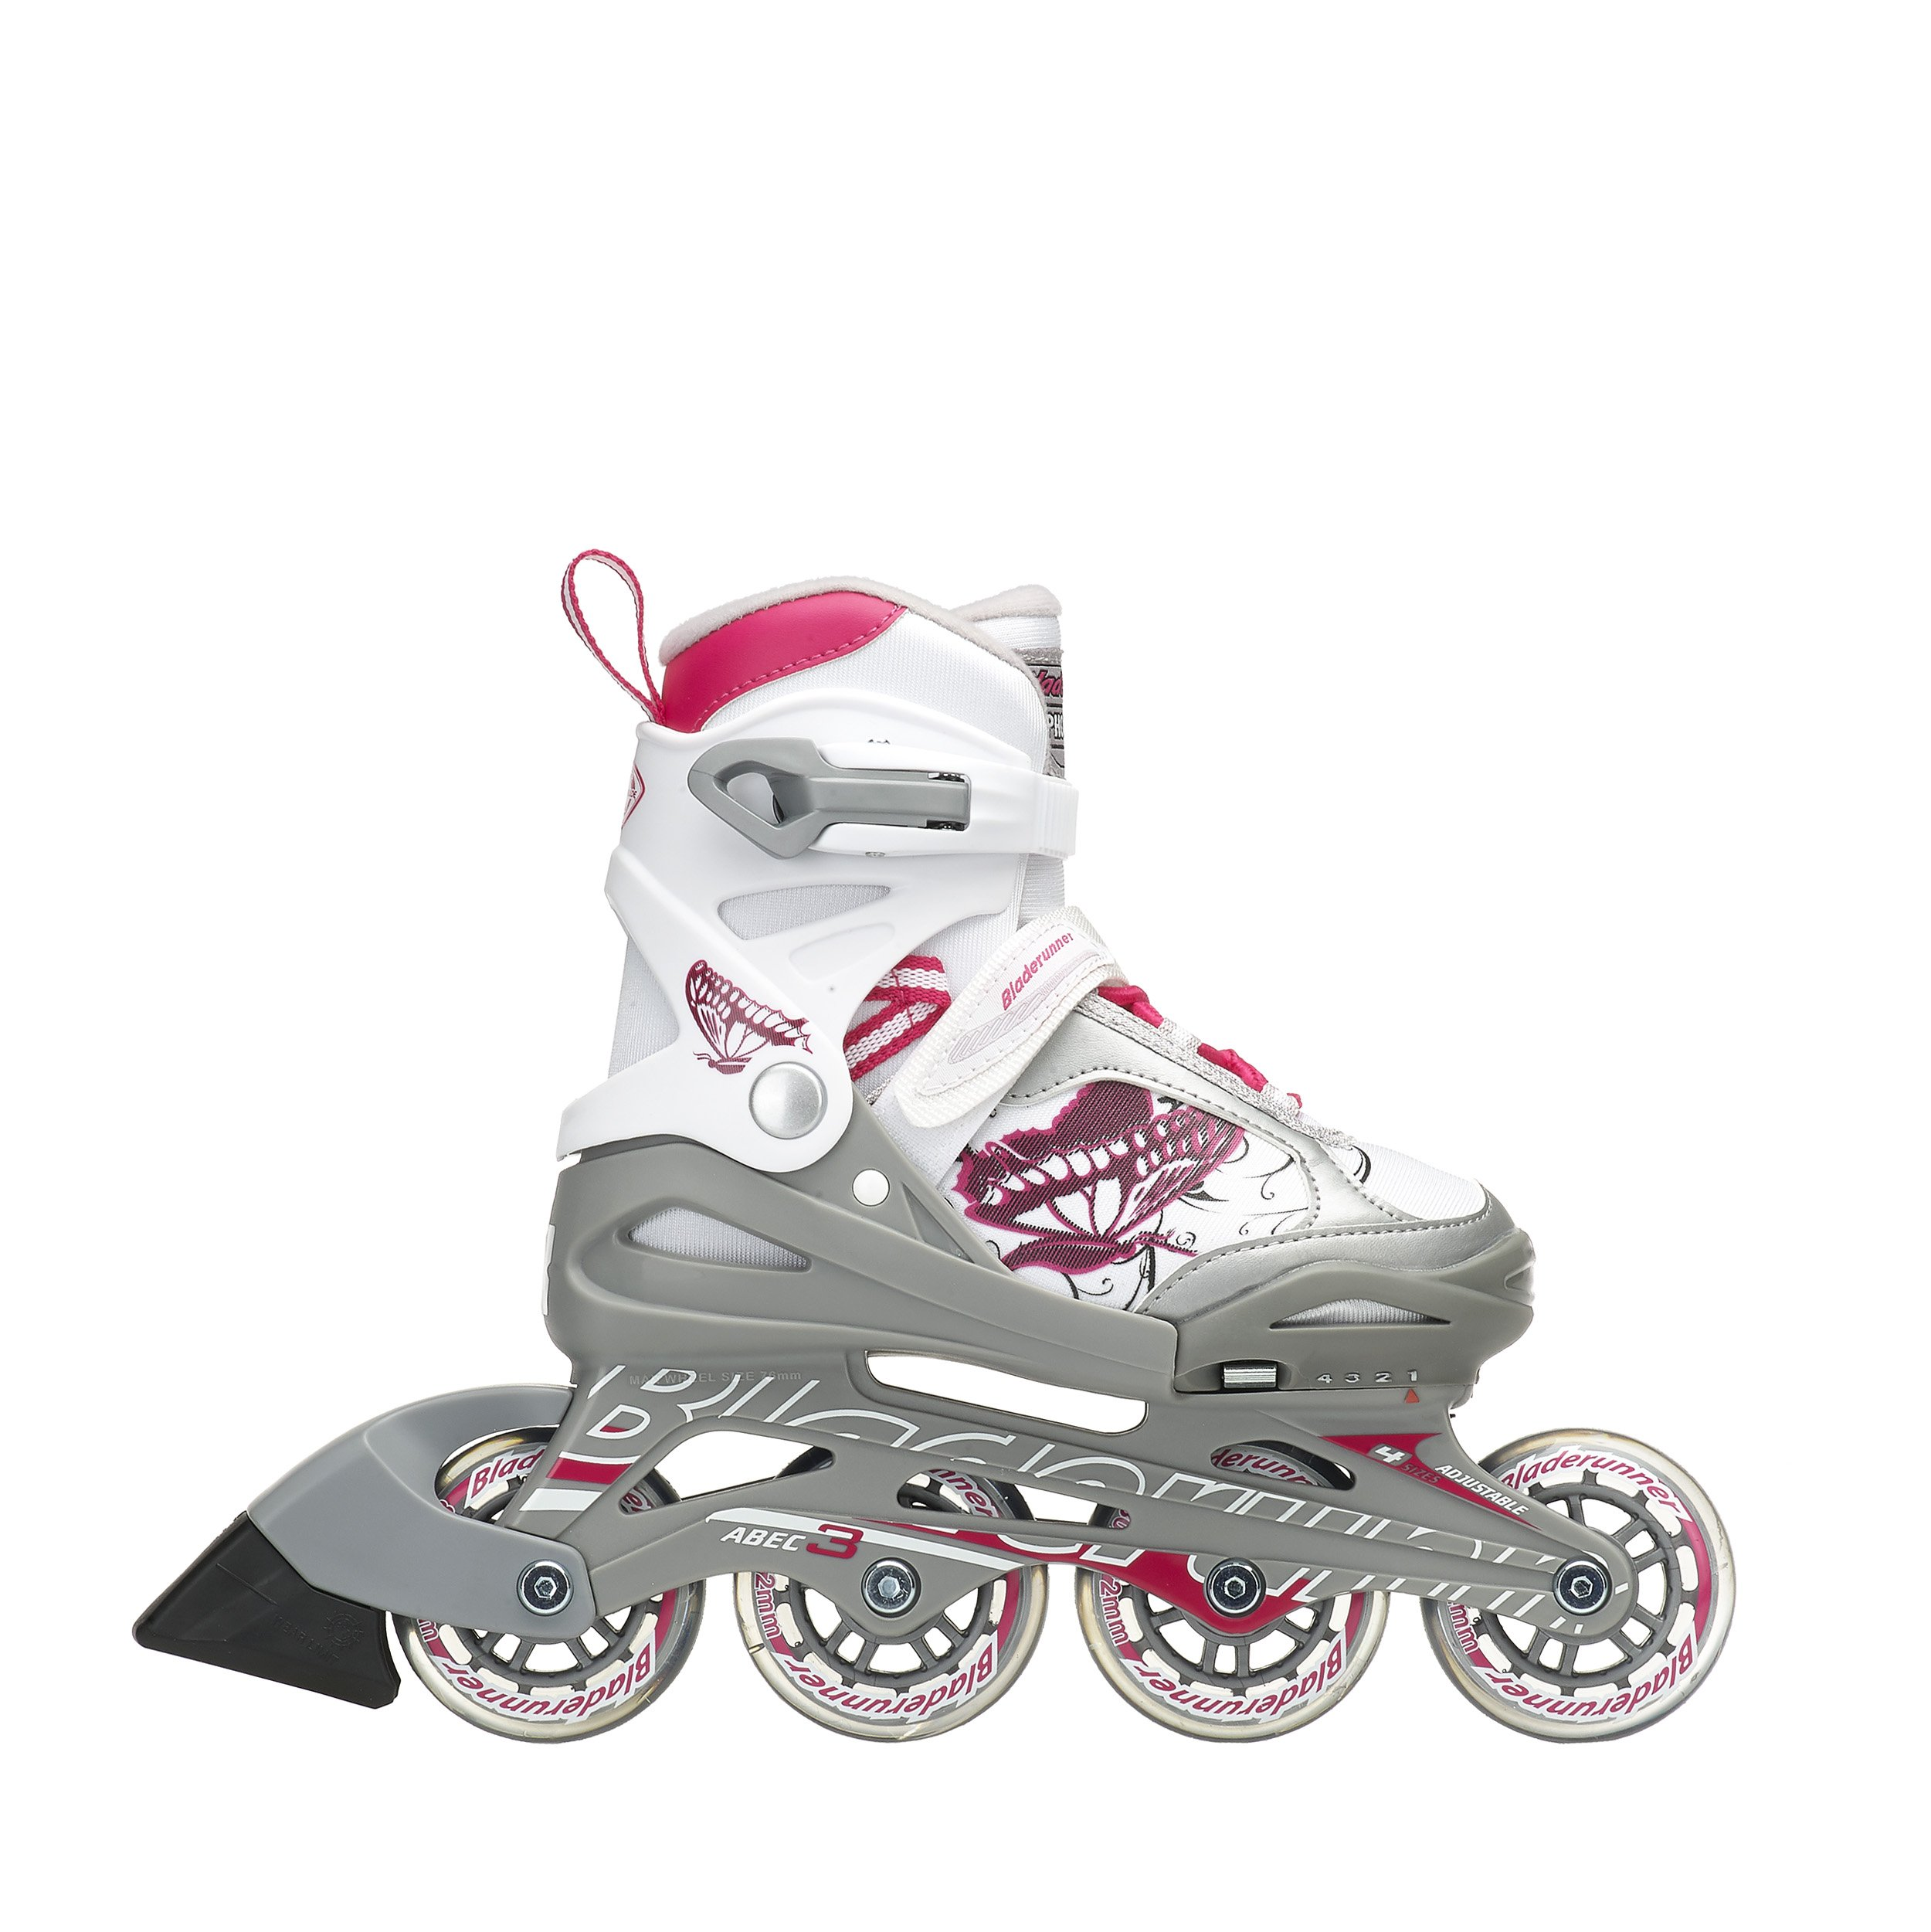 Rollerblade Bladerunner Phoenix Girls Adjustable Fitness Inline Skate, White and Pink, Junior, Value Performance Inline Skates, Youth Junior 1 to 4 by Rollerblade (Image #5)